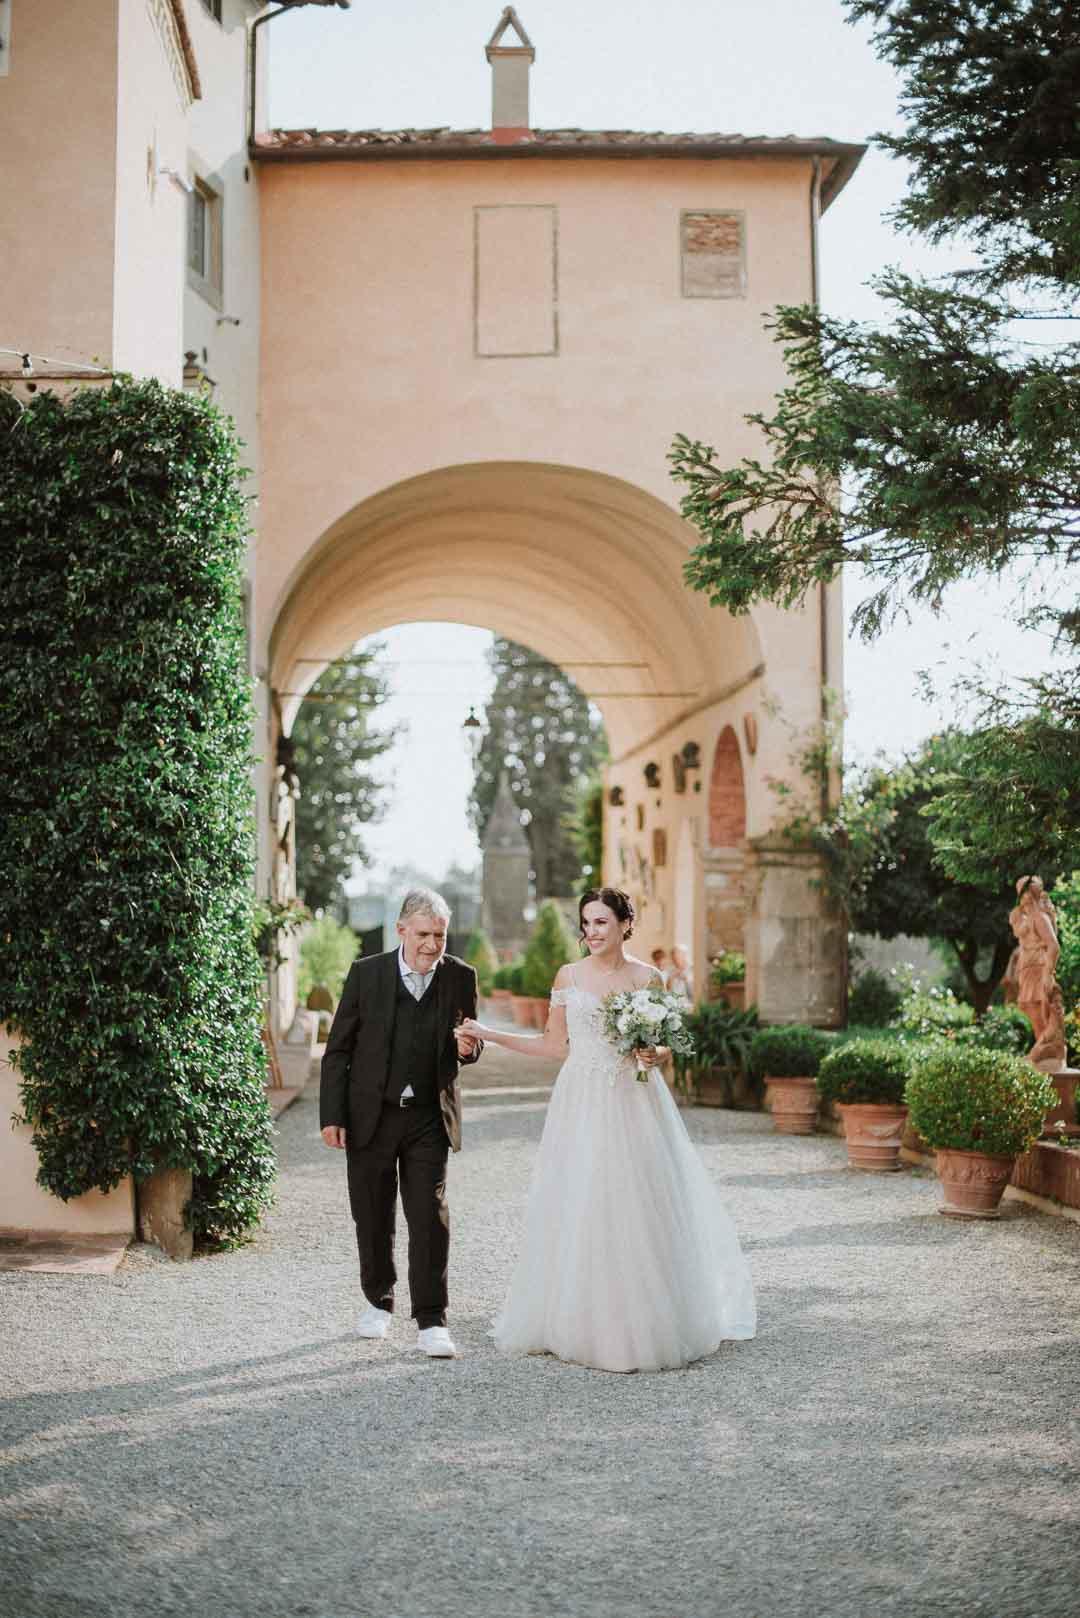 wedding-photographer-destination-fineart-bespoke-reportage-tuscany-villascorzi-vivianeizzo-spazio46-63